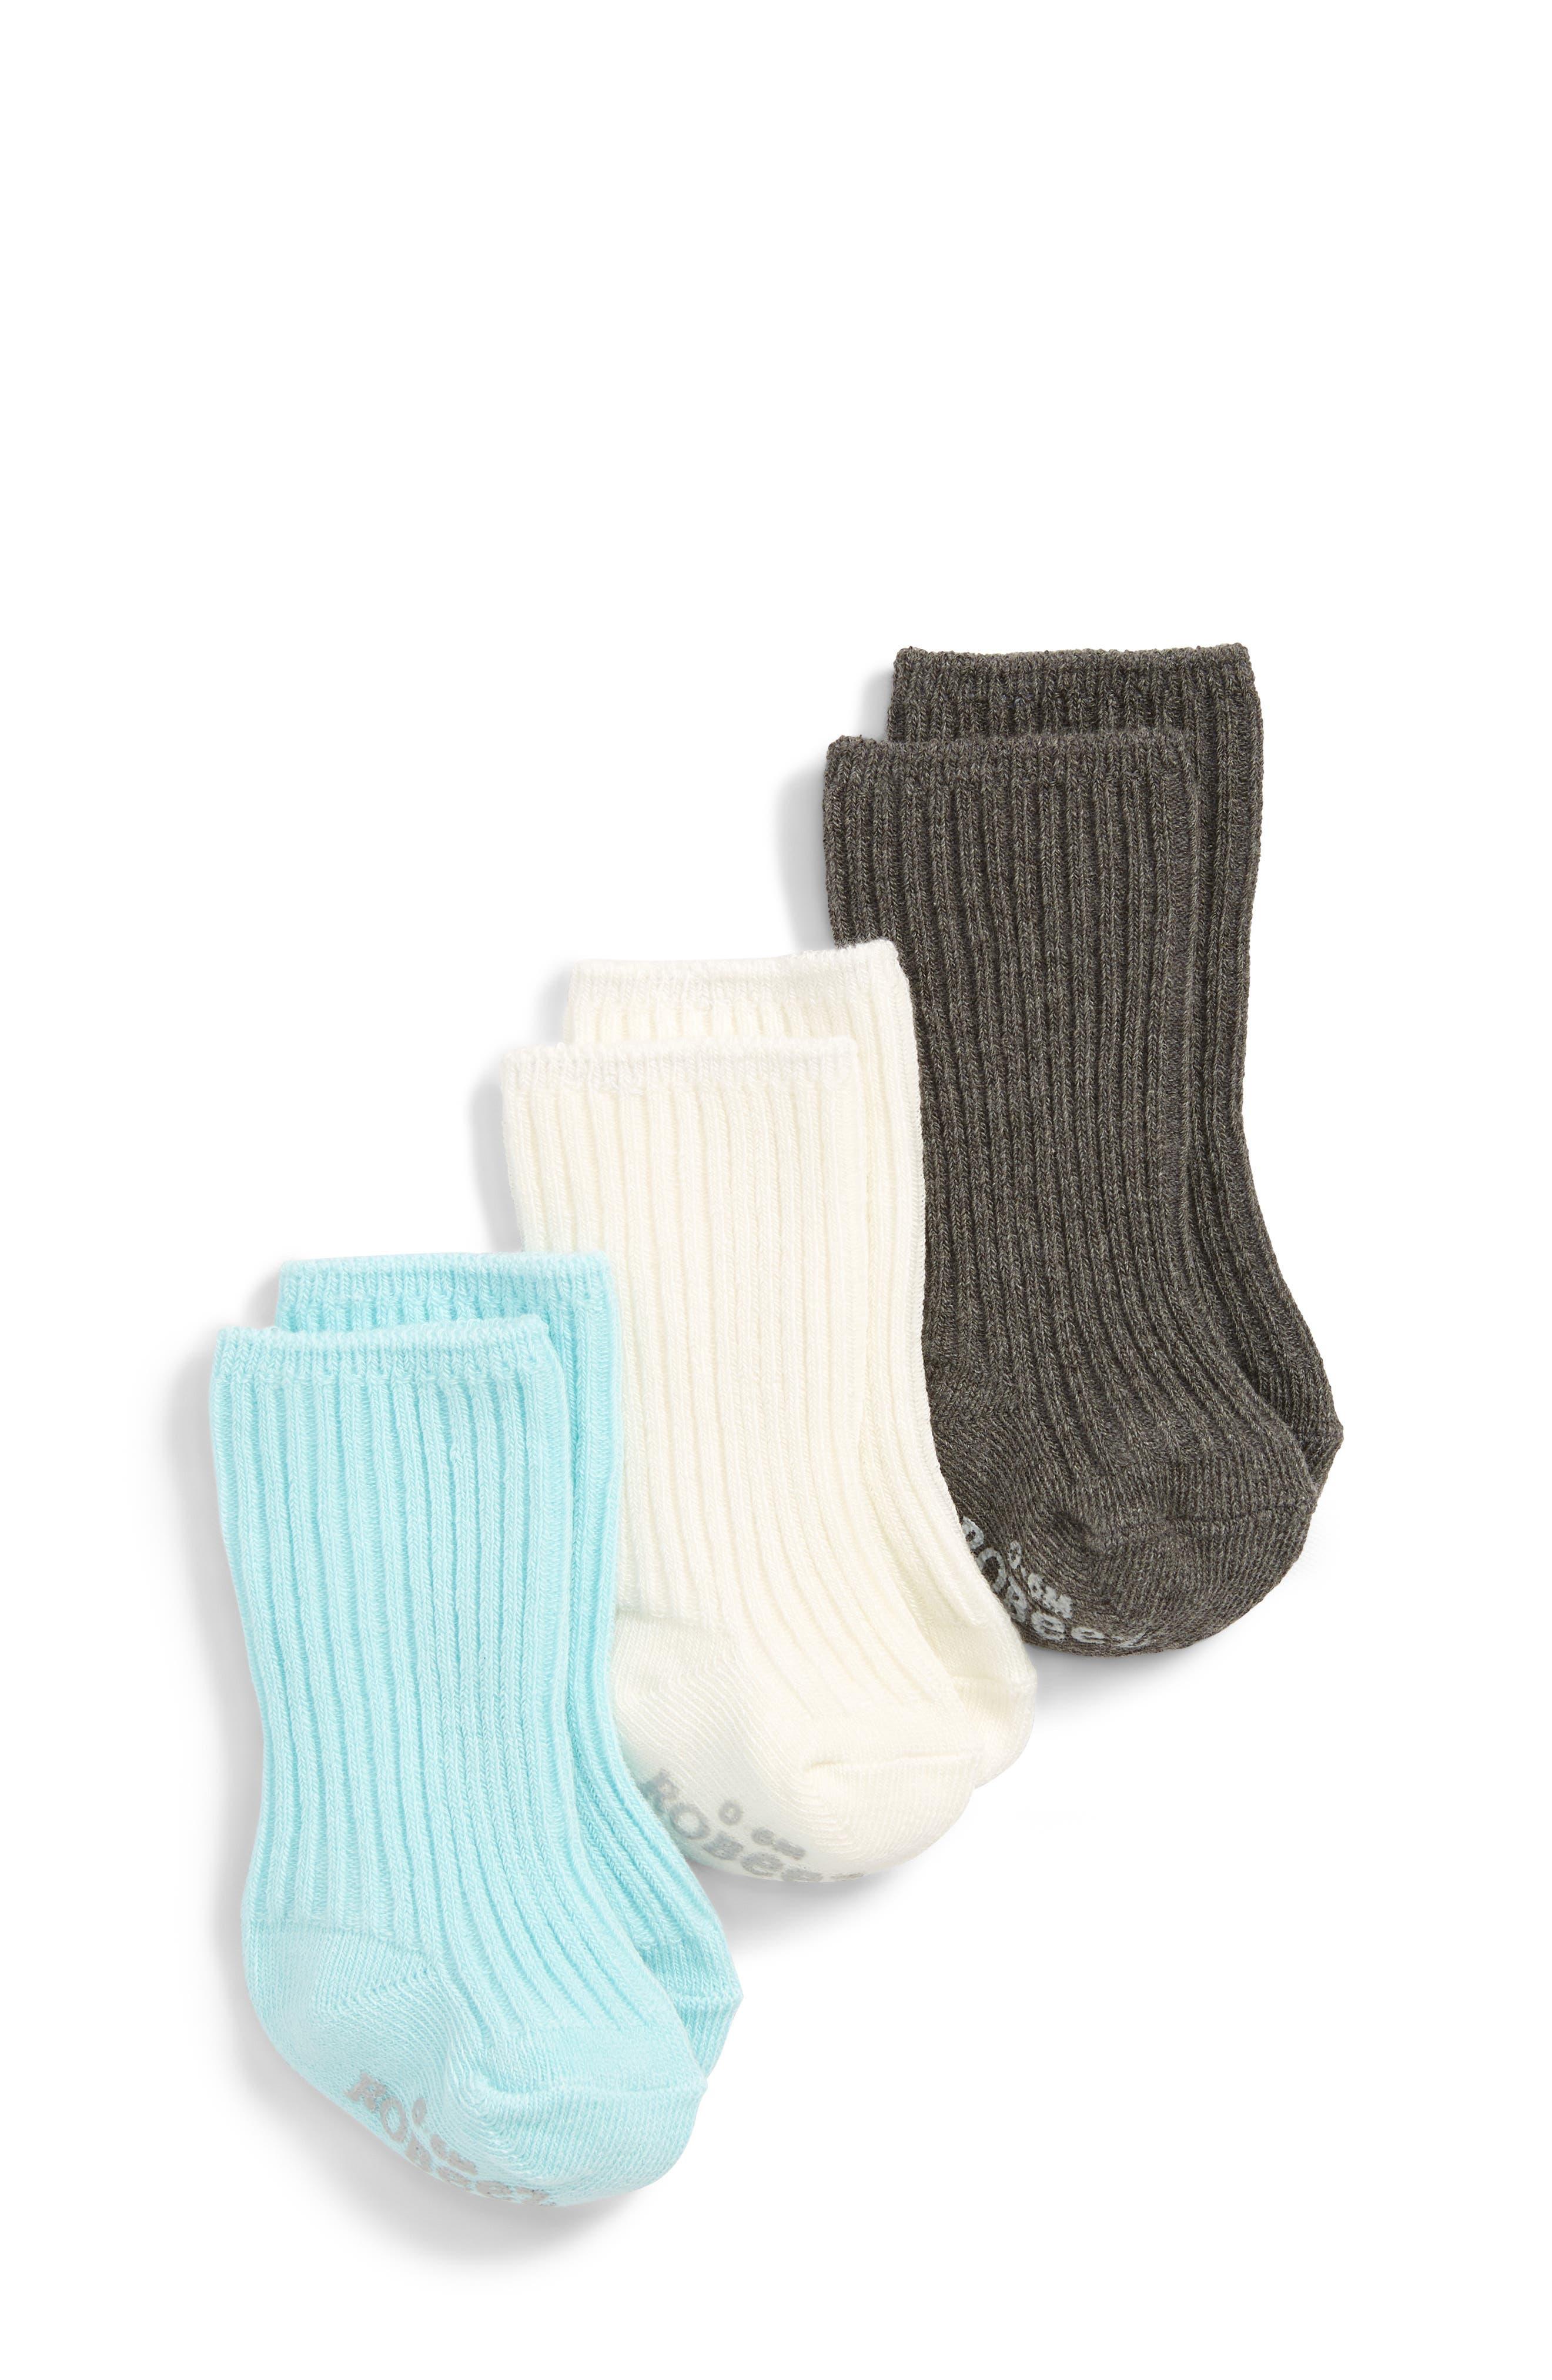 3-Pack Tabitha Basic Socks,                         Main,                         color, CREAM/ AQUA/ GREY